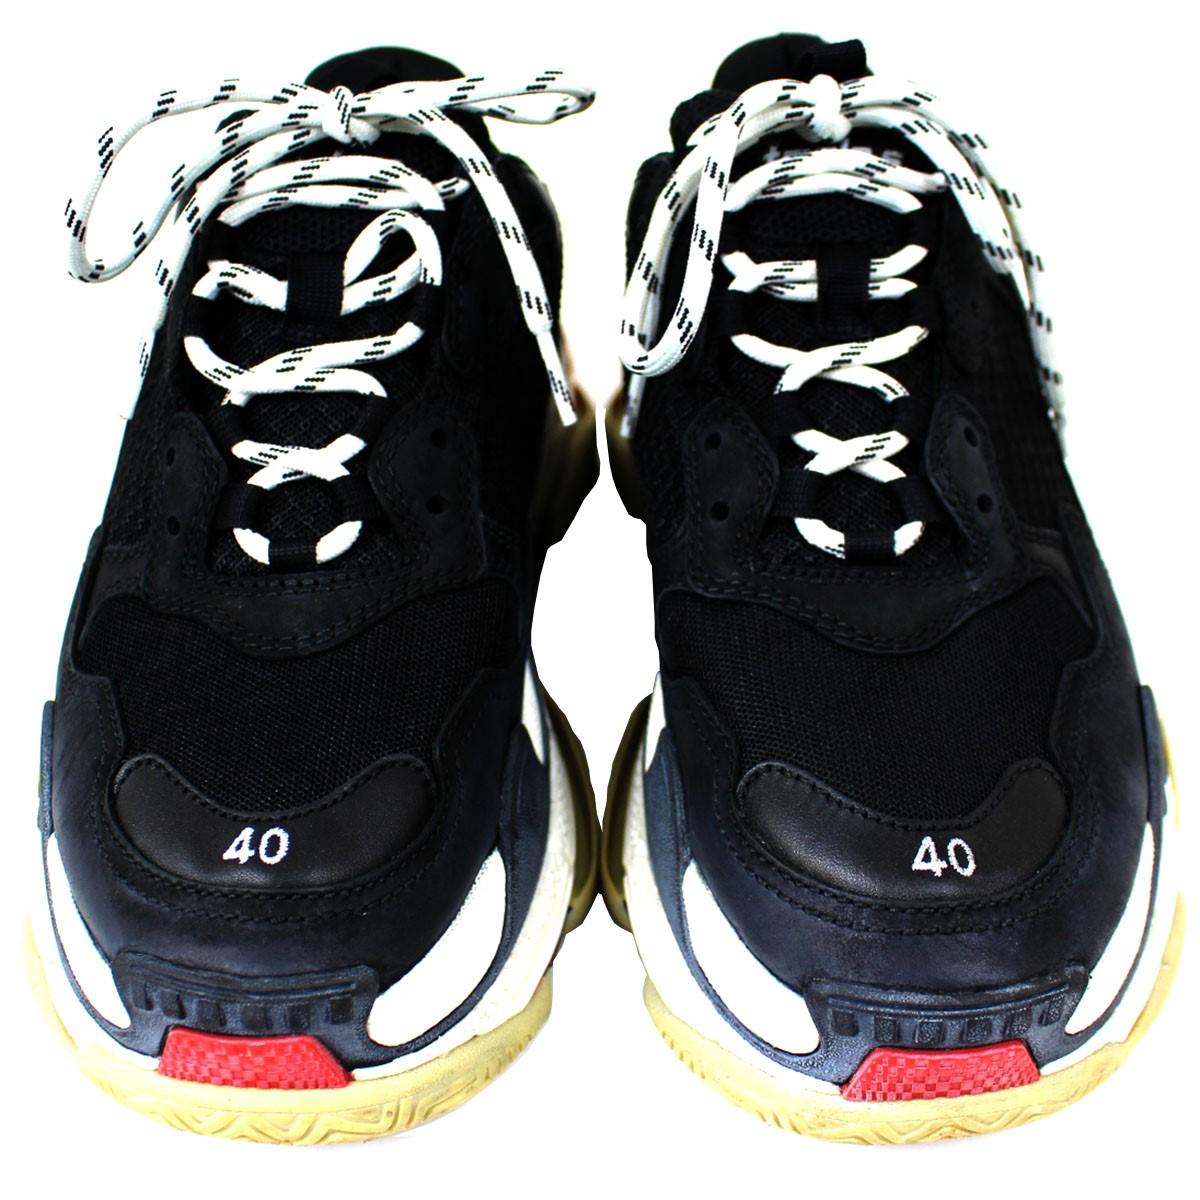 Balenciaga Triple S Sneakers Black Red in